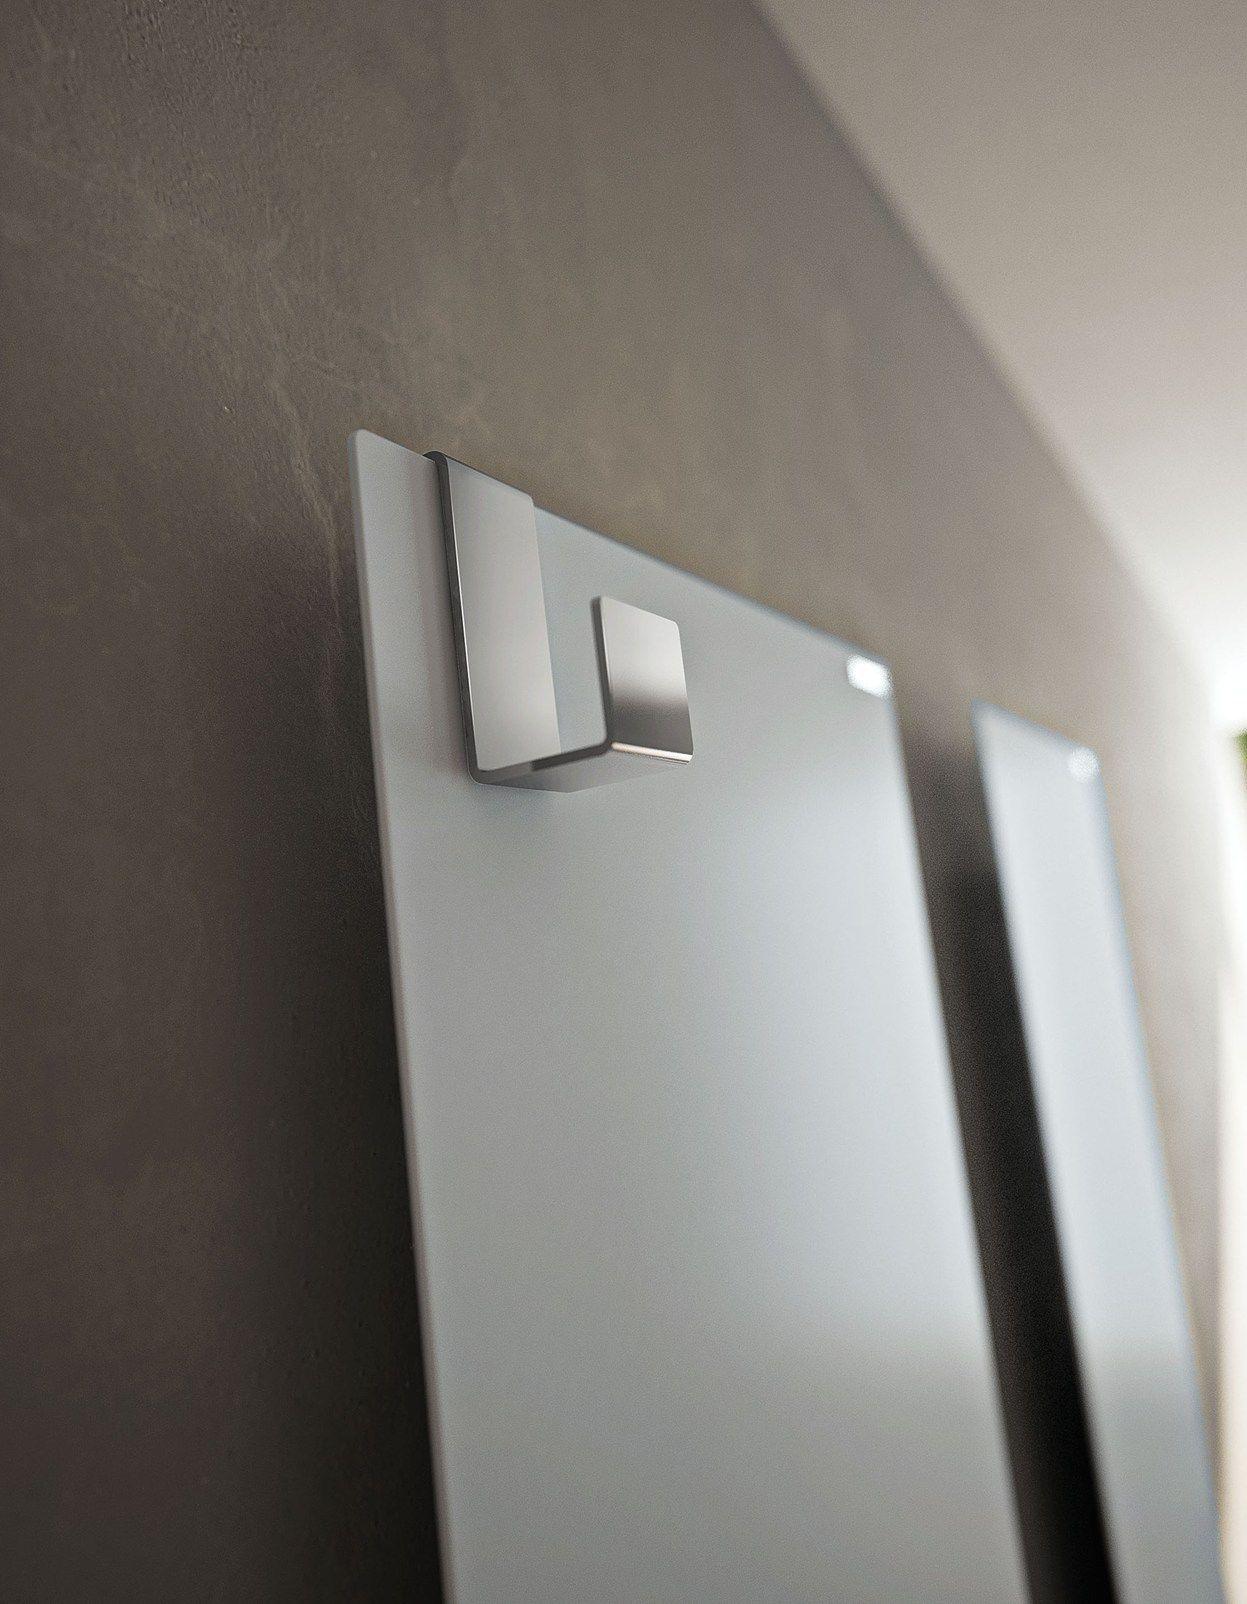 Antrax IT vince il premio Interior Innovation Award 2014